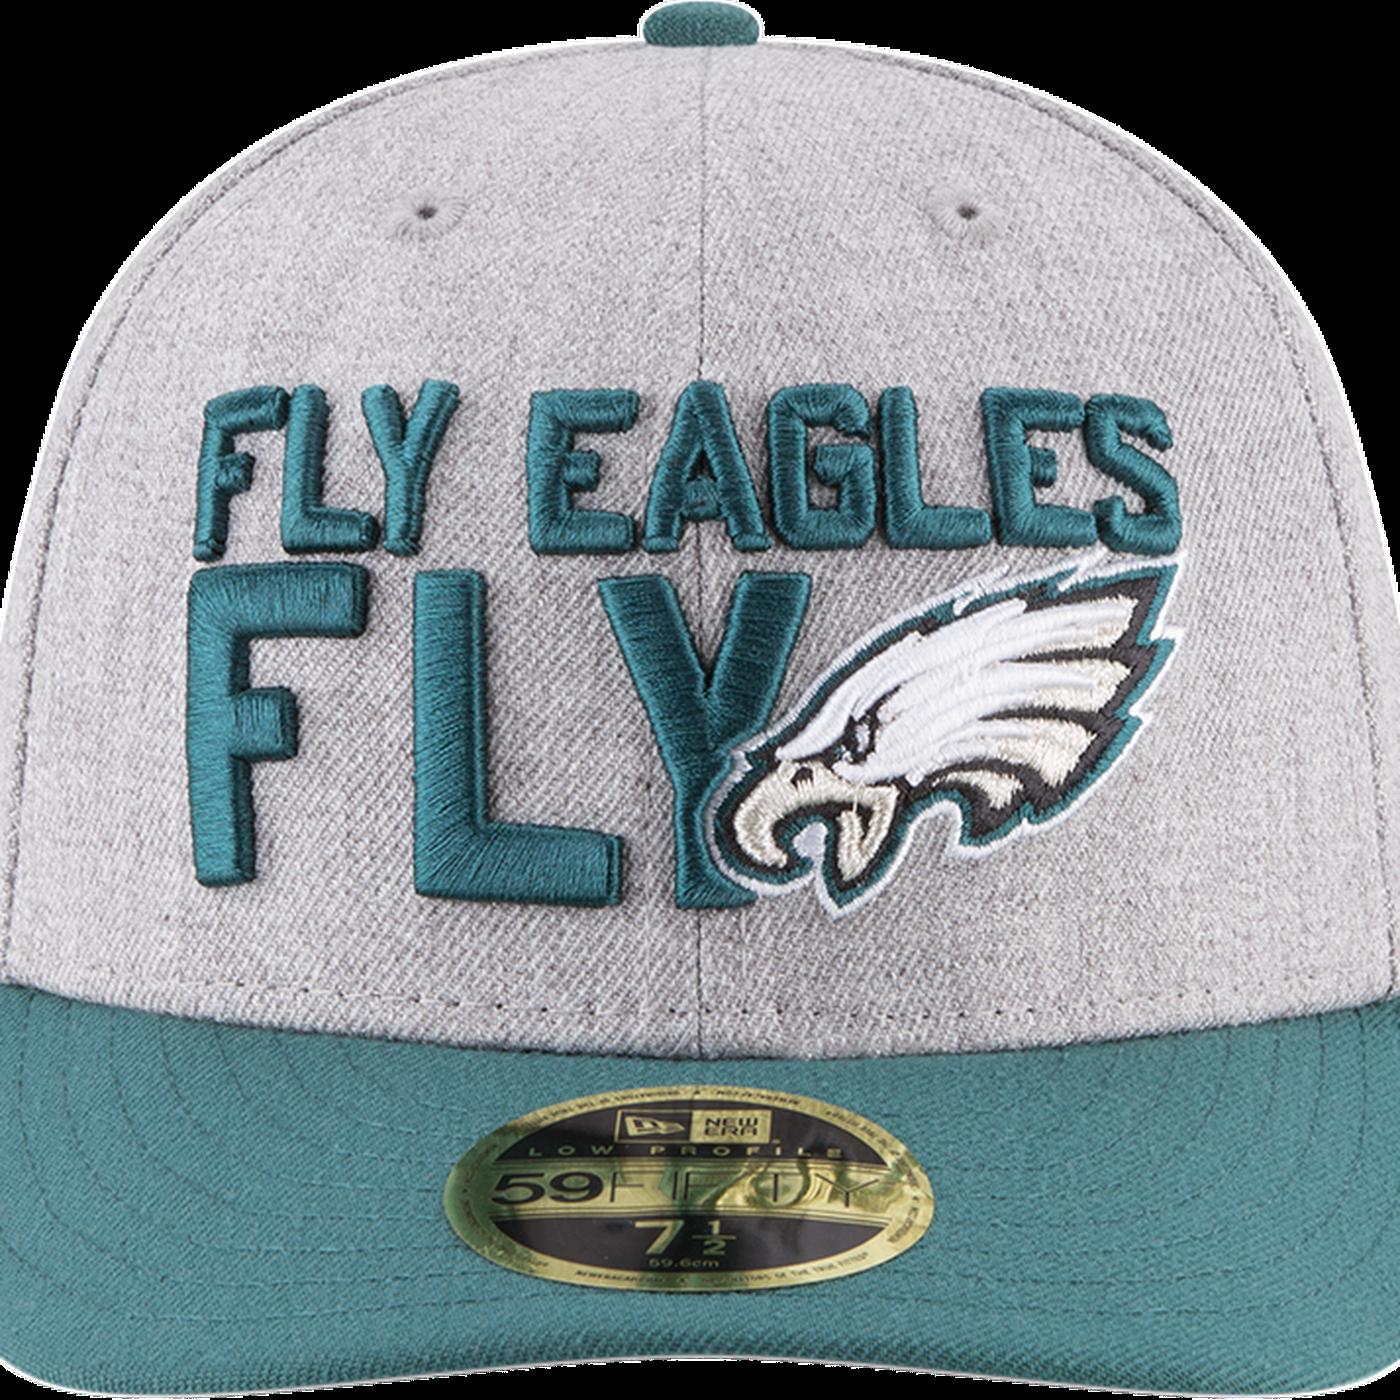 The 2018 NFL Draft hats are not good - Bleeding Green Nation b44ab94da6e